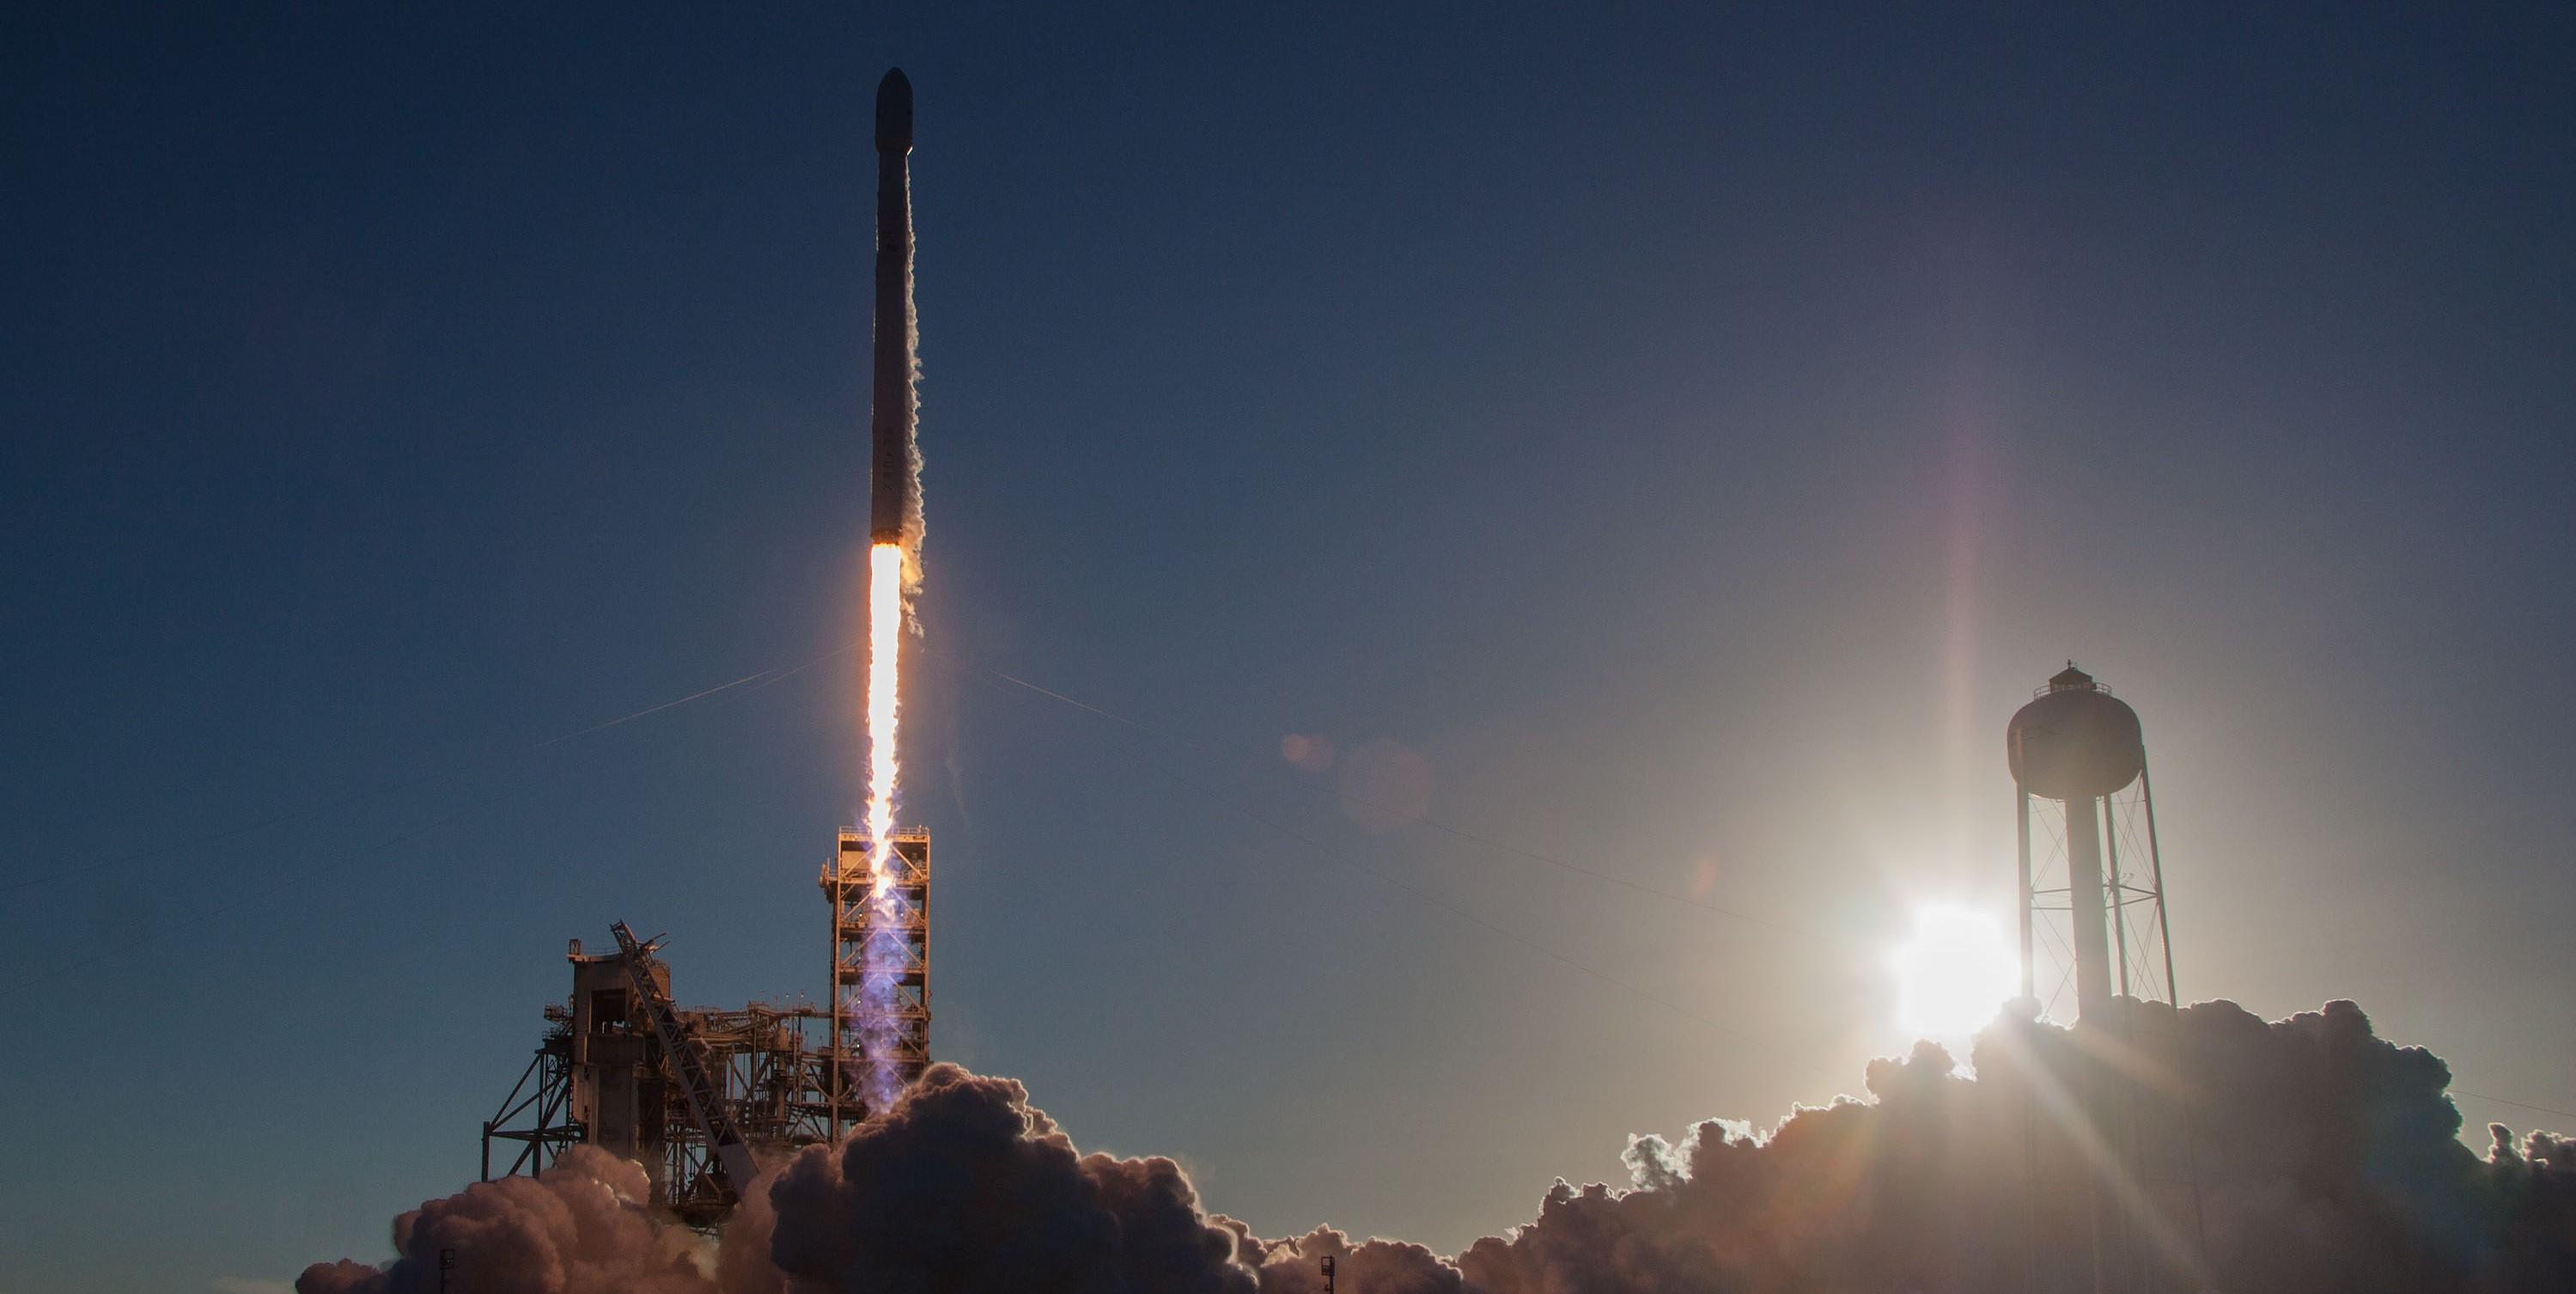 Intelsat 35e Falcon 9 July 2017 (SpaceX) launch 5 crop